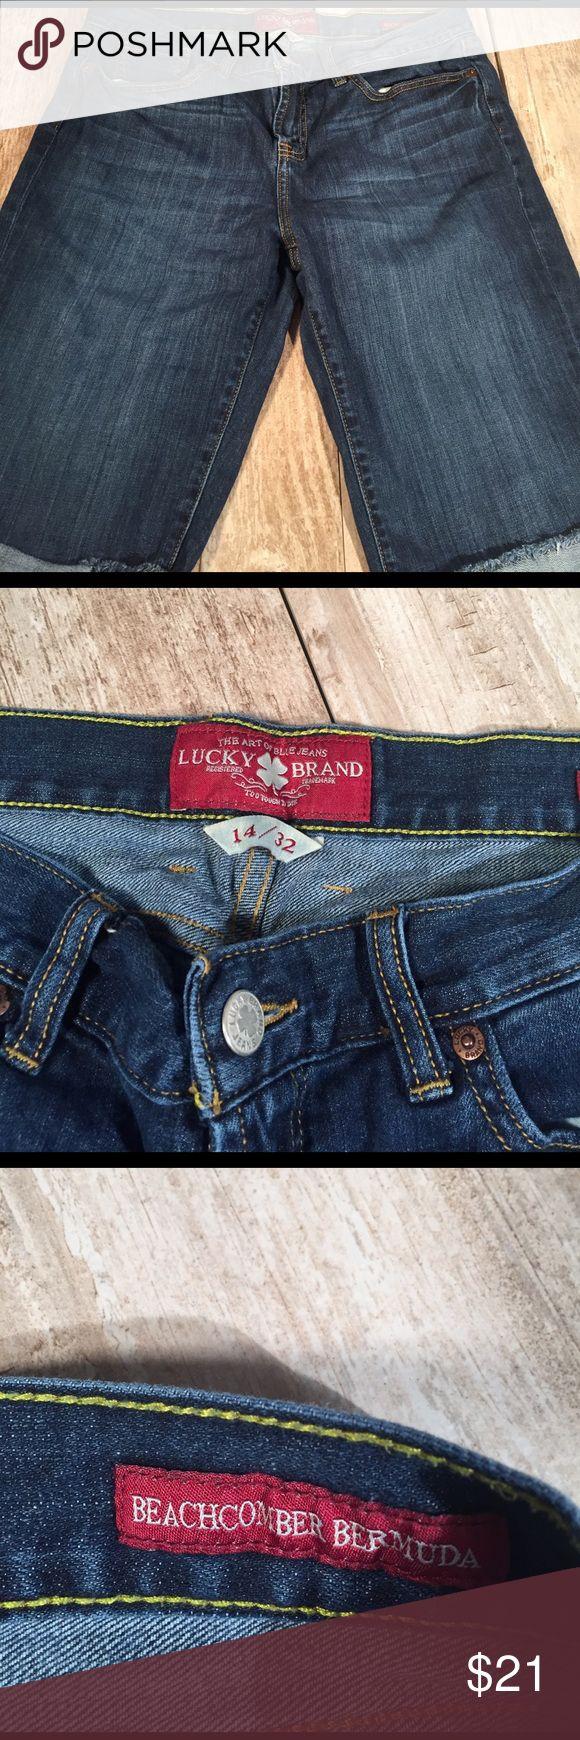 Lucky brand woman's beachcomber Bermuda shorts Lucky brand size 14/32 beachcomber Bermuda shorts Lucky Brand Shorts Bermudas